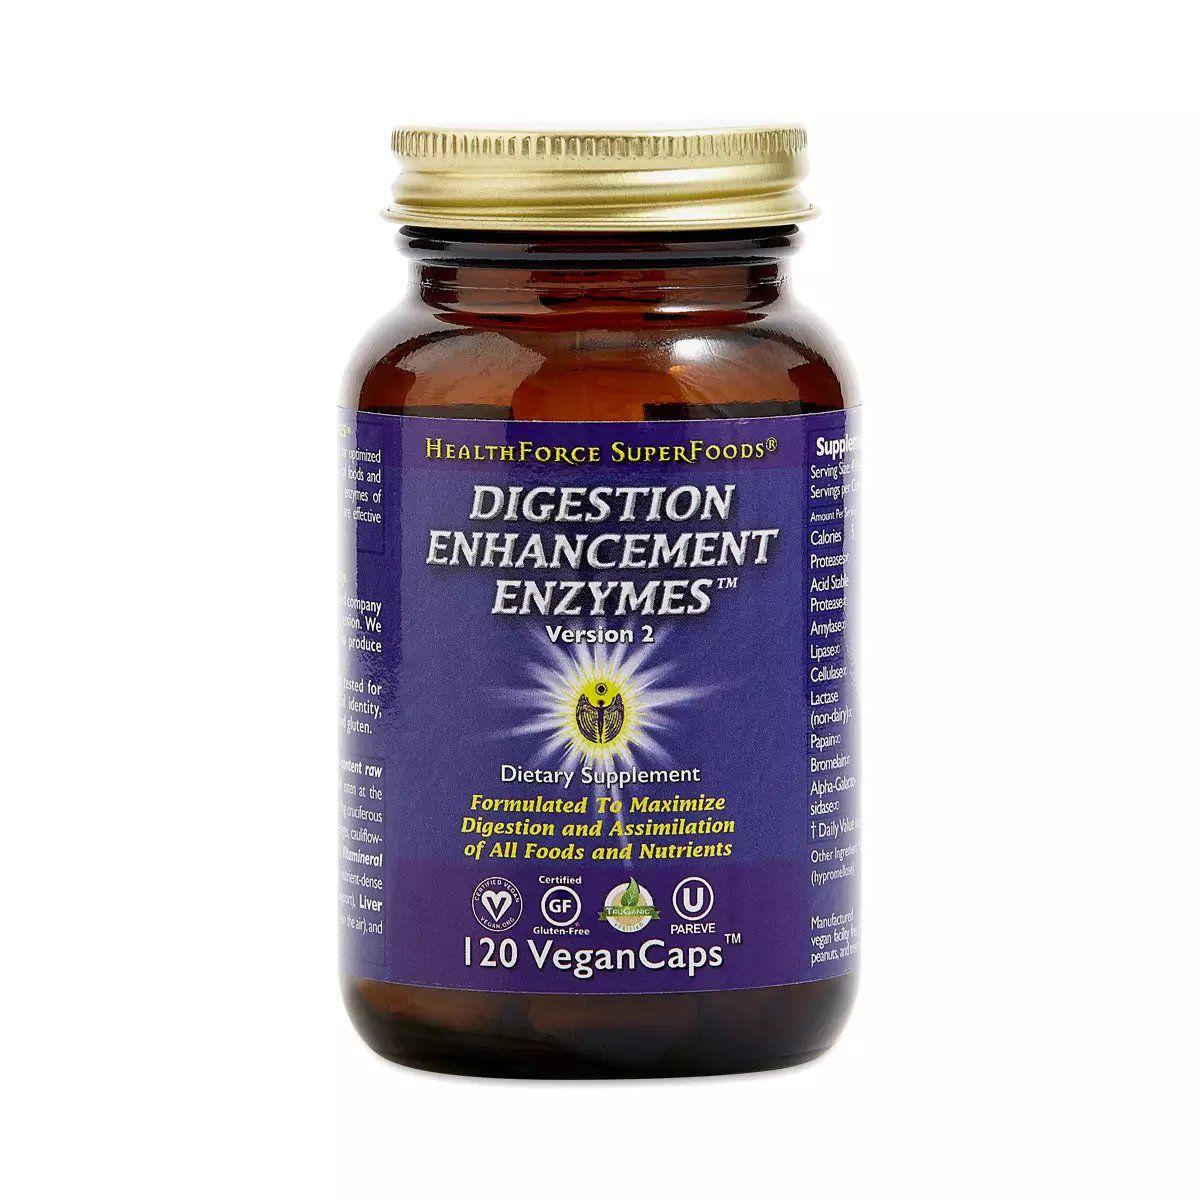 HealthForce SuperFoods Digestion Enhancement Enzymes